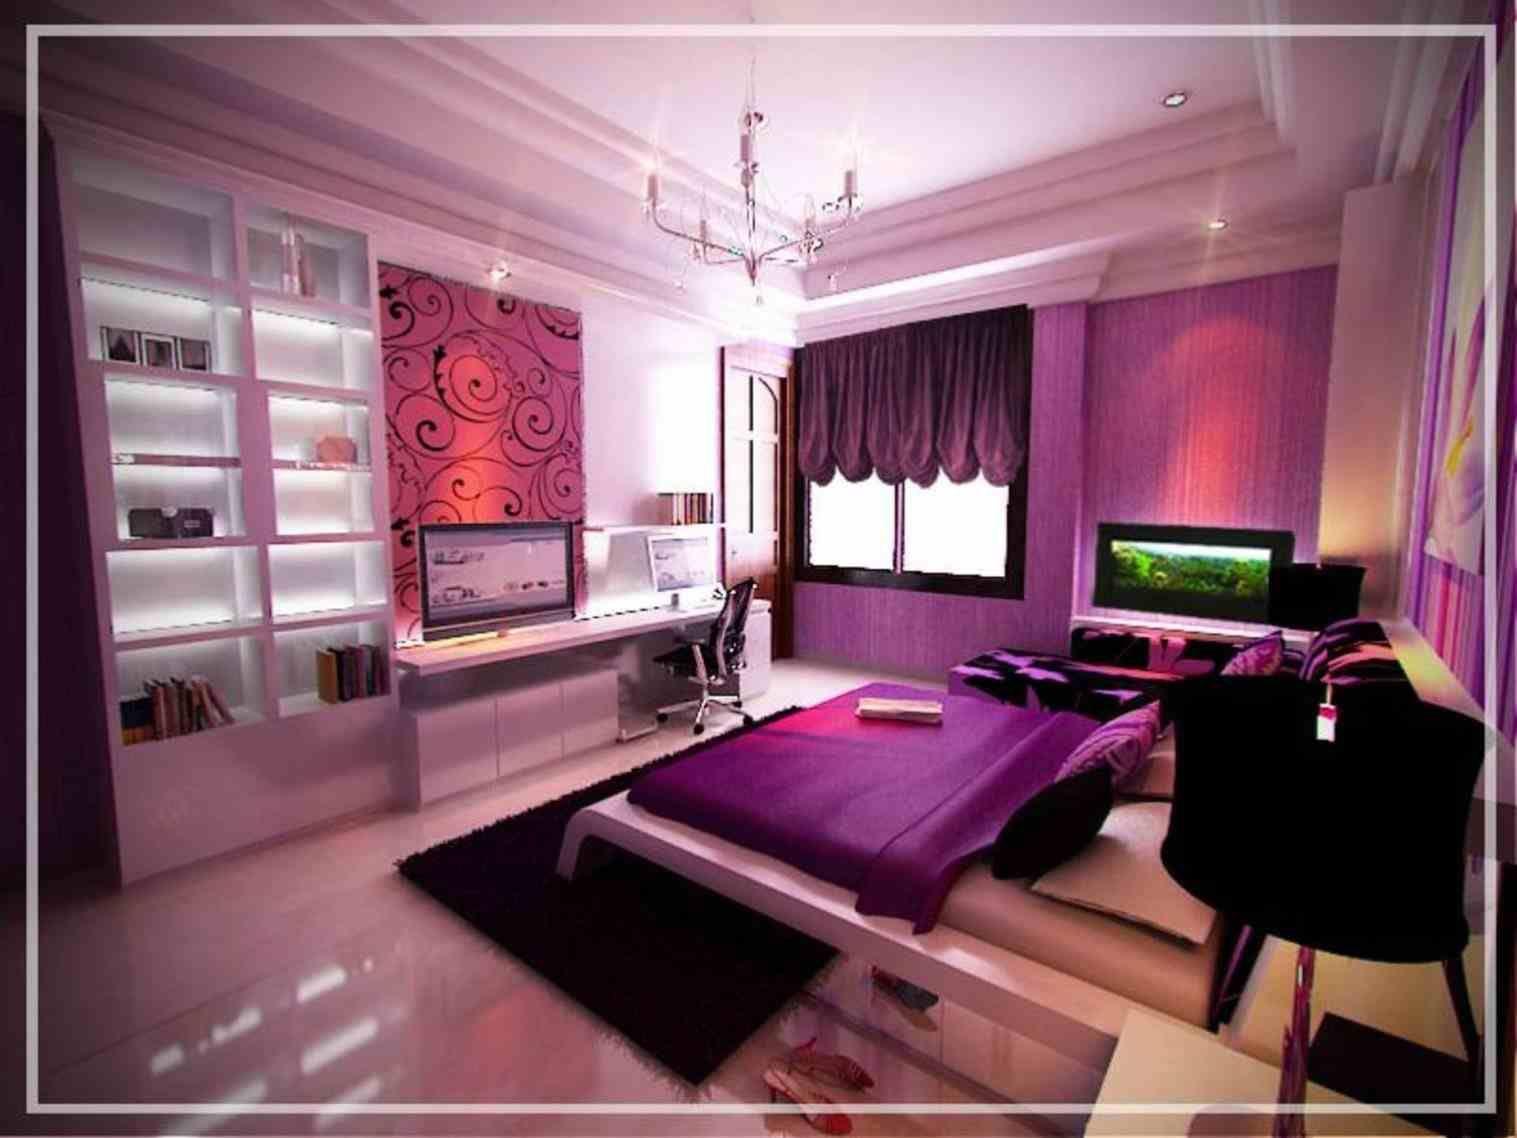 Malik Zayn hairstyle from backside, Dress Junior purple for bridal shower moment